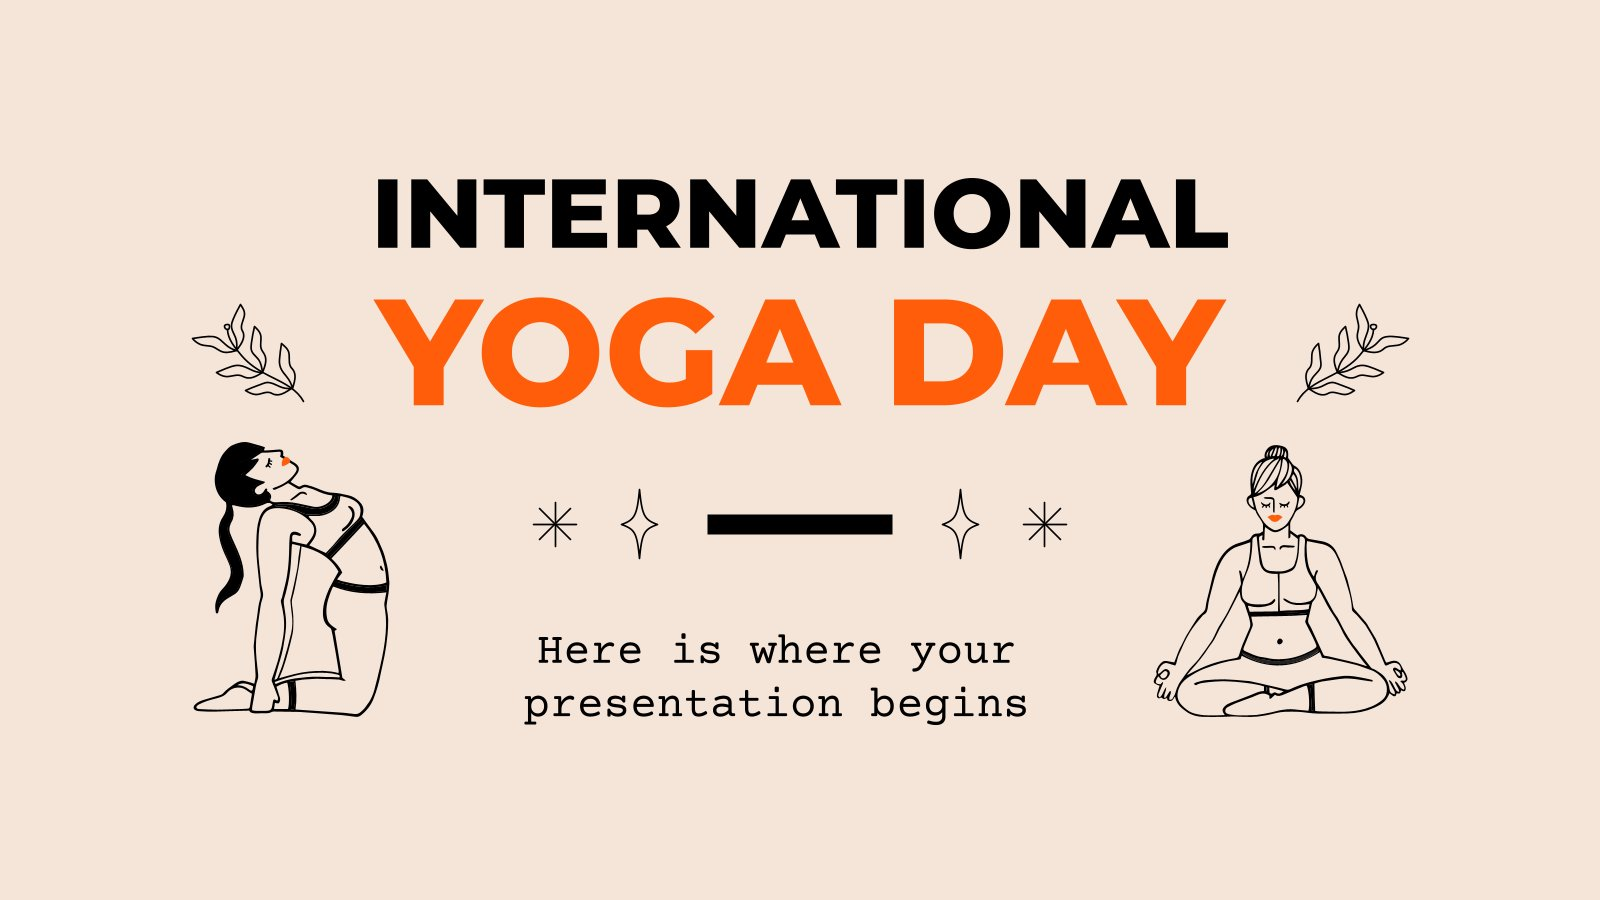 International Yoga Day presentation template